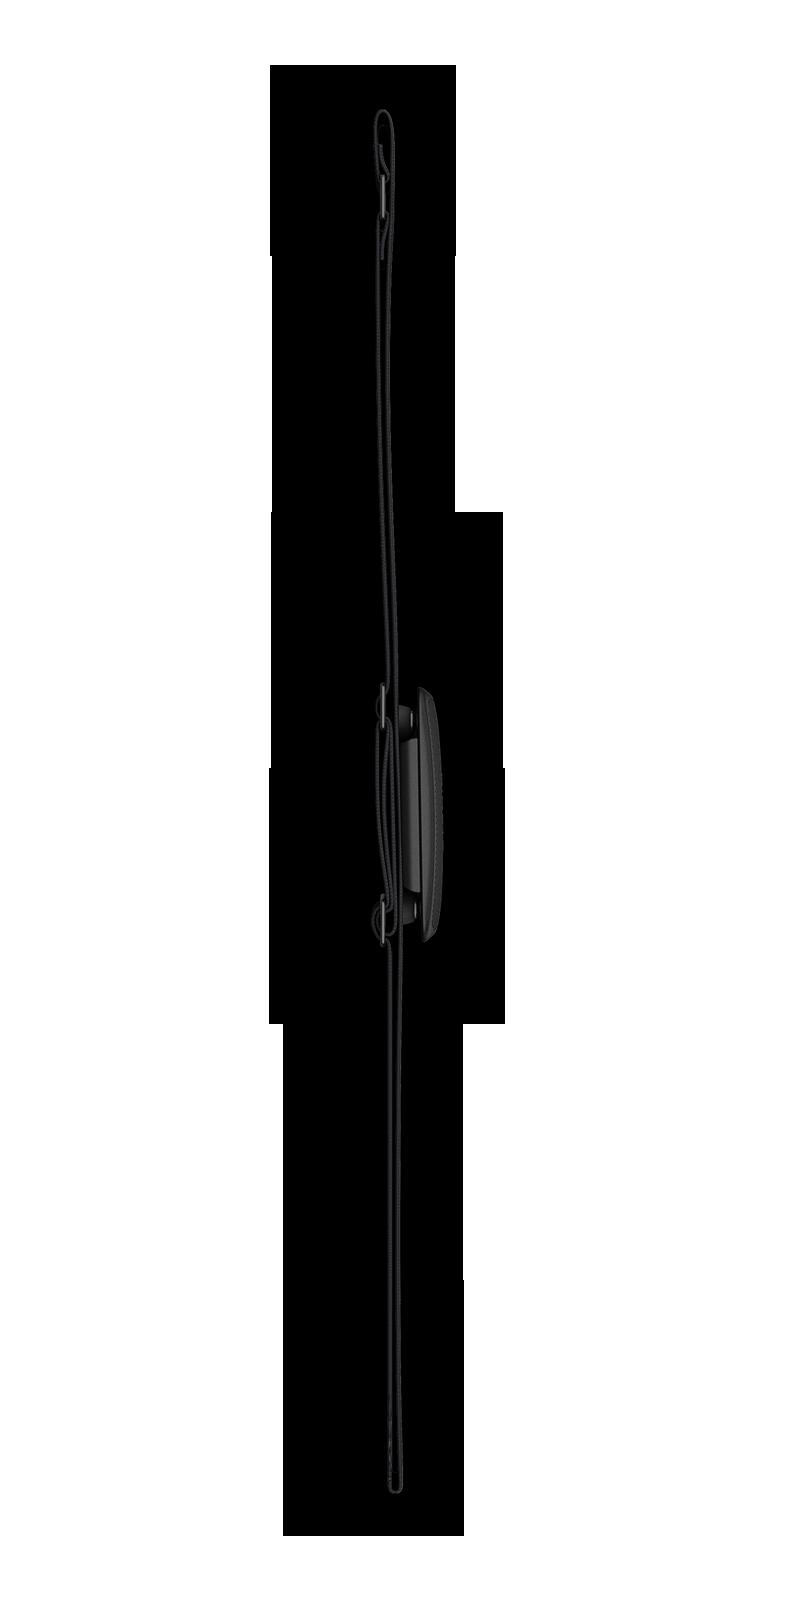 Garmin ANT+ og Bluetooth HRM Dual Pulsbælte - 424,00 | Heart rate monitors